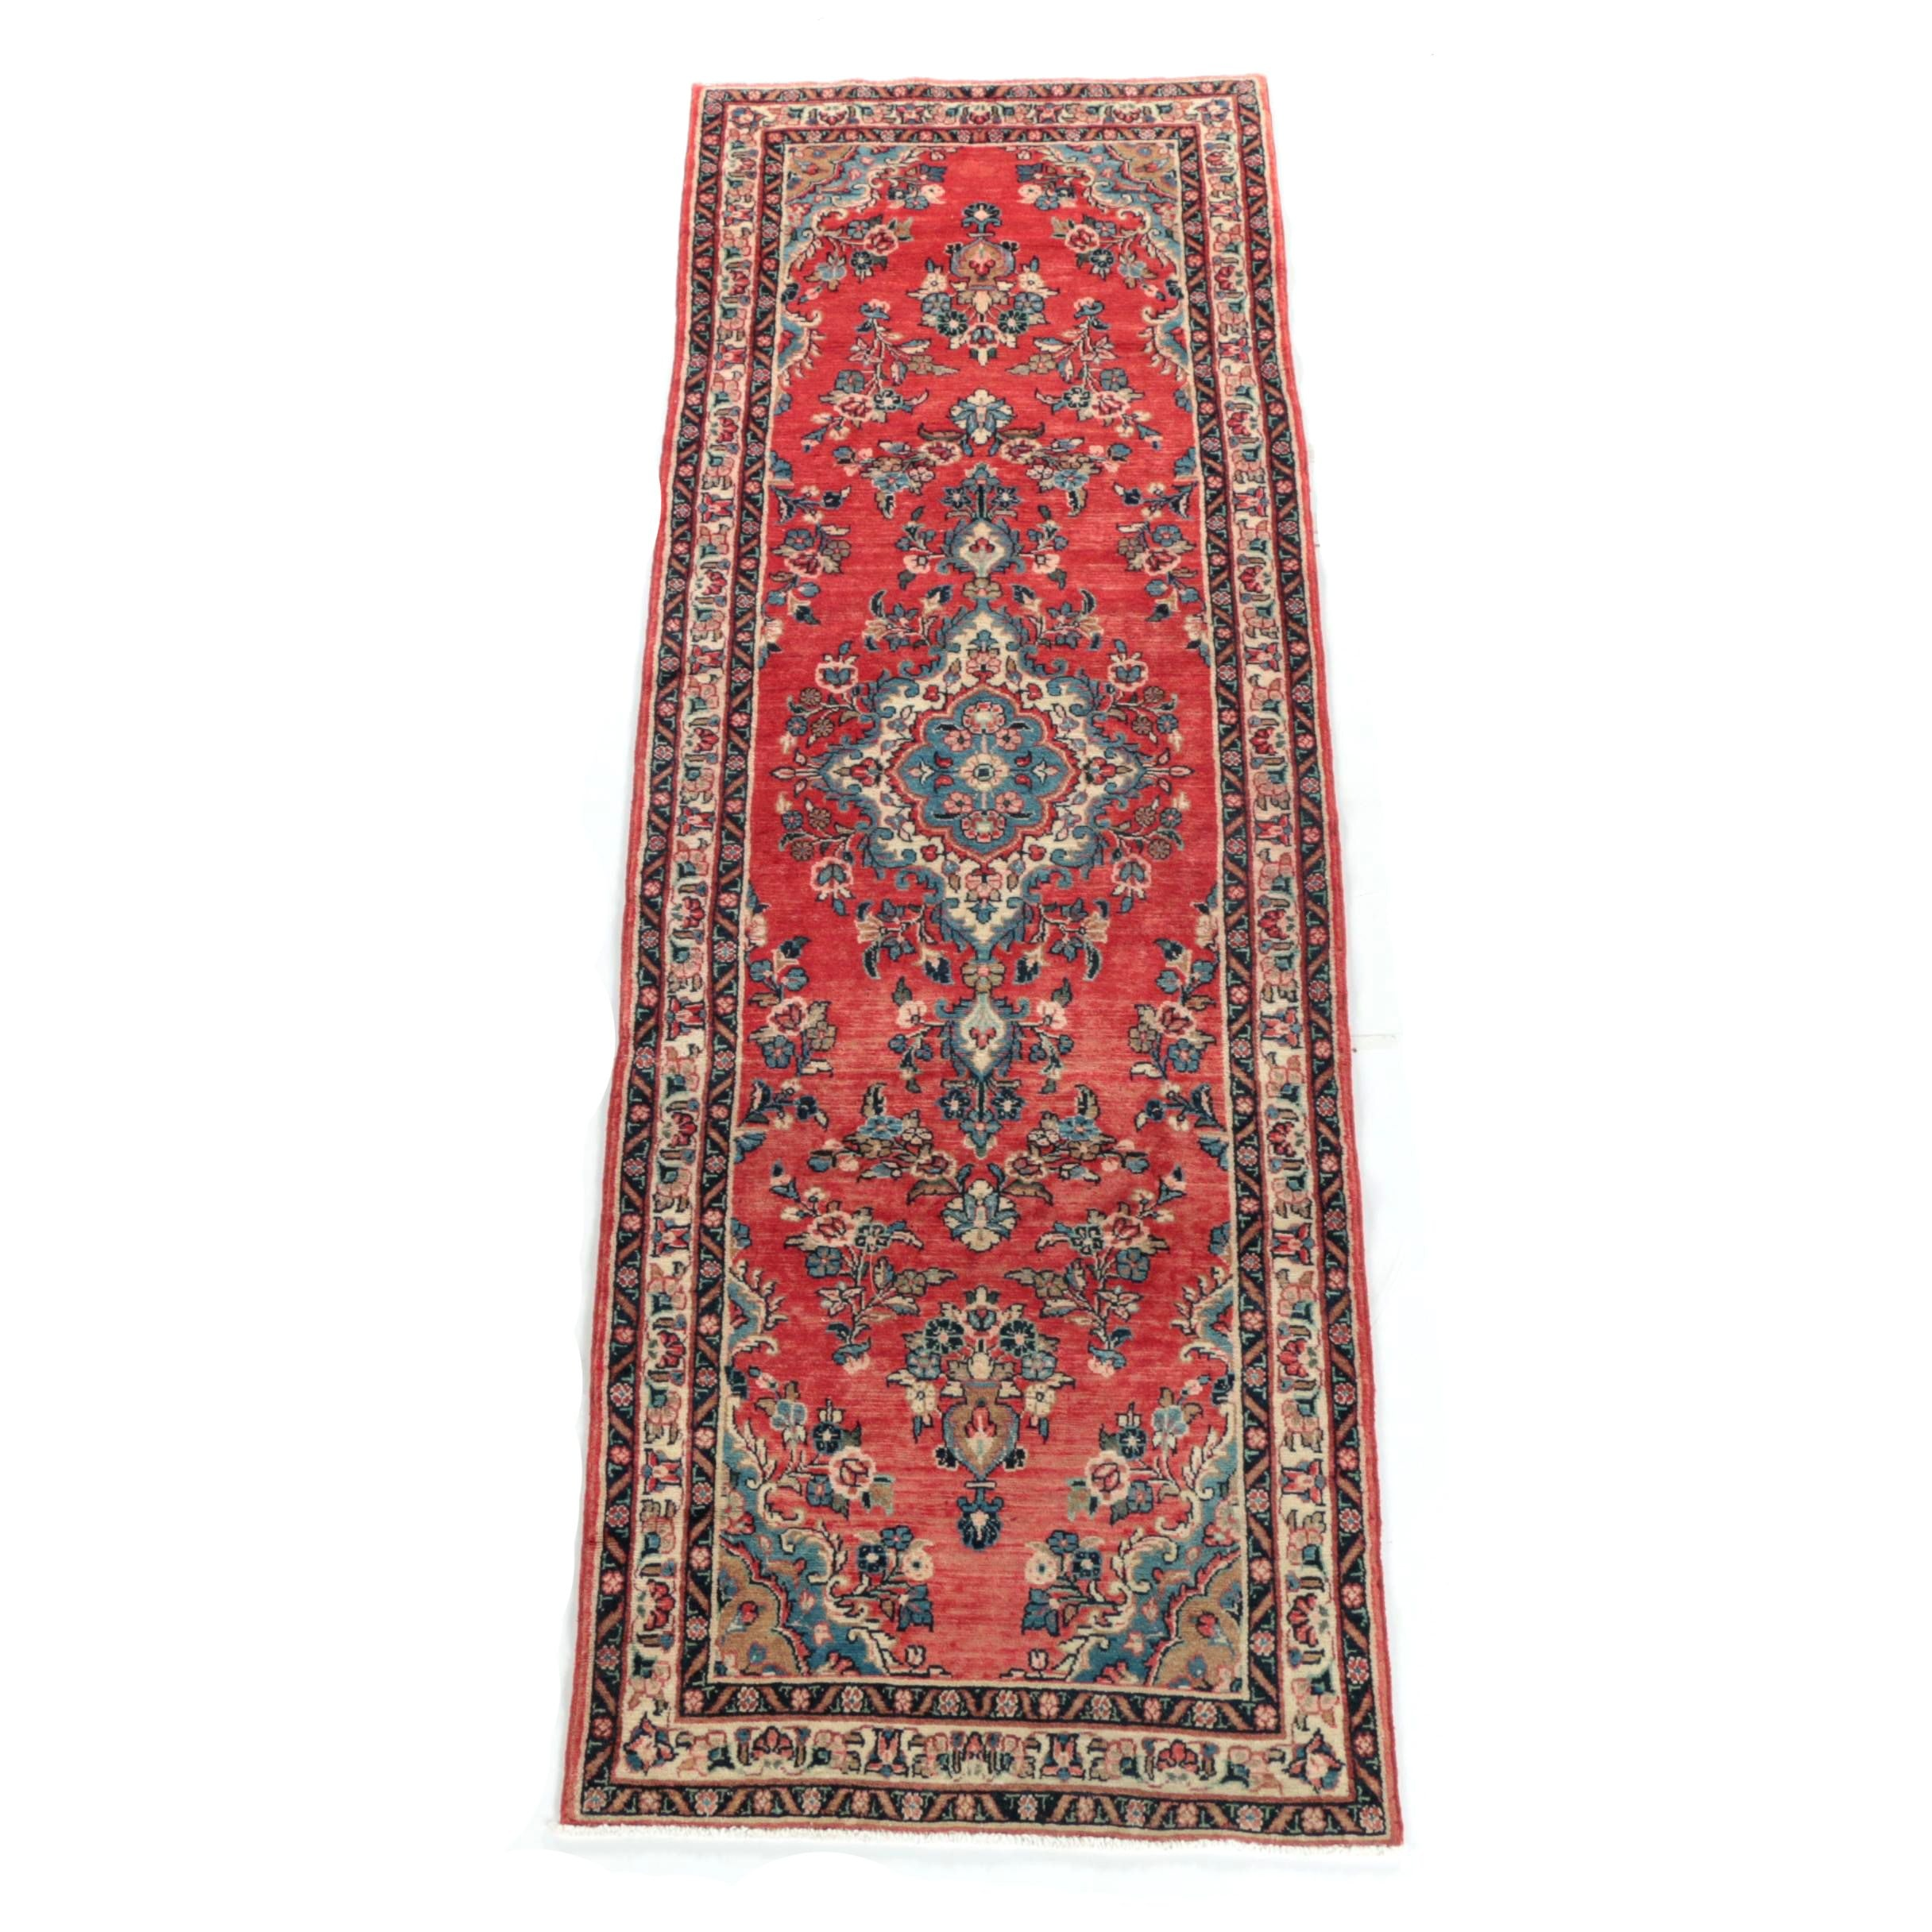 Hand-Knotted Persian Kerman Wool Carpet Runner